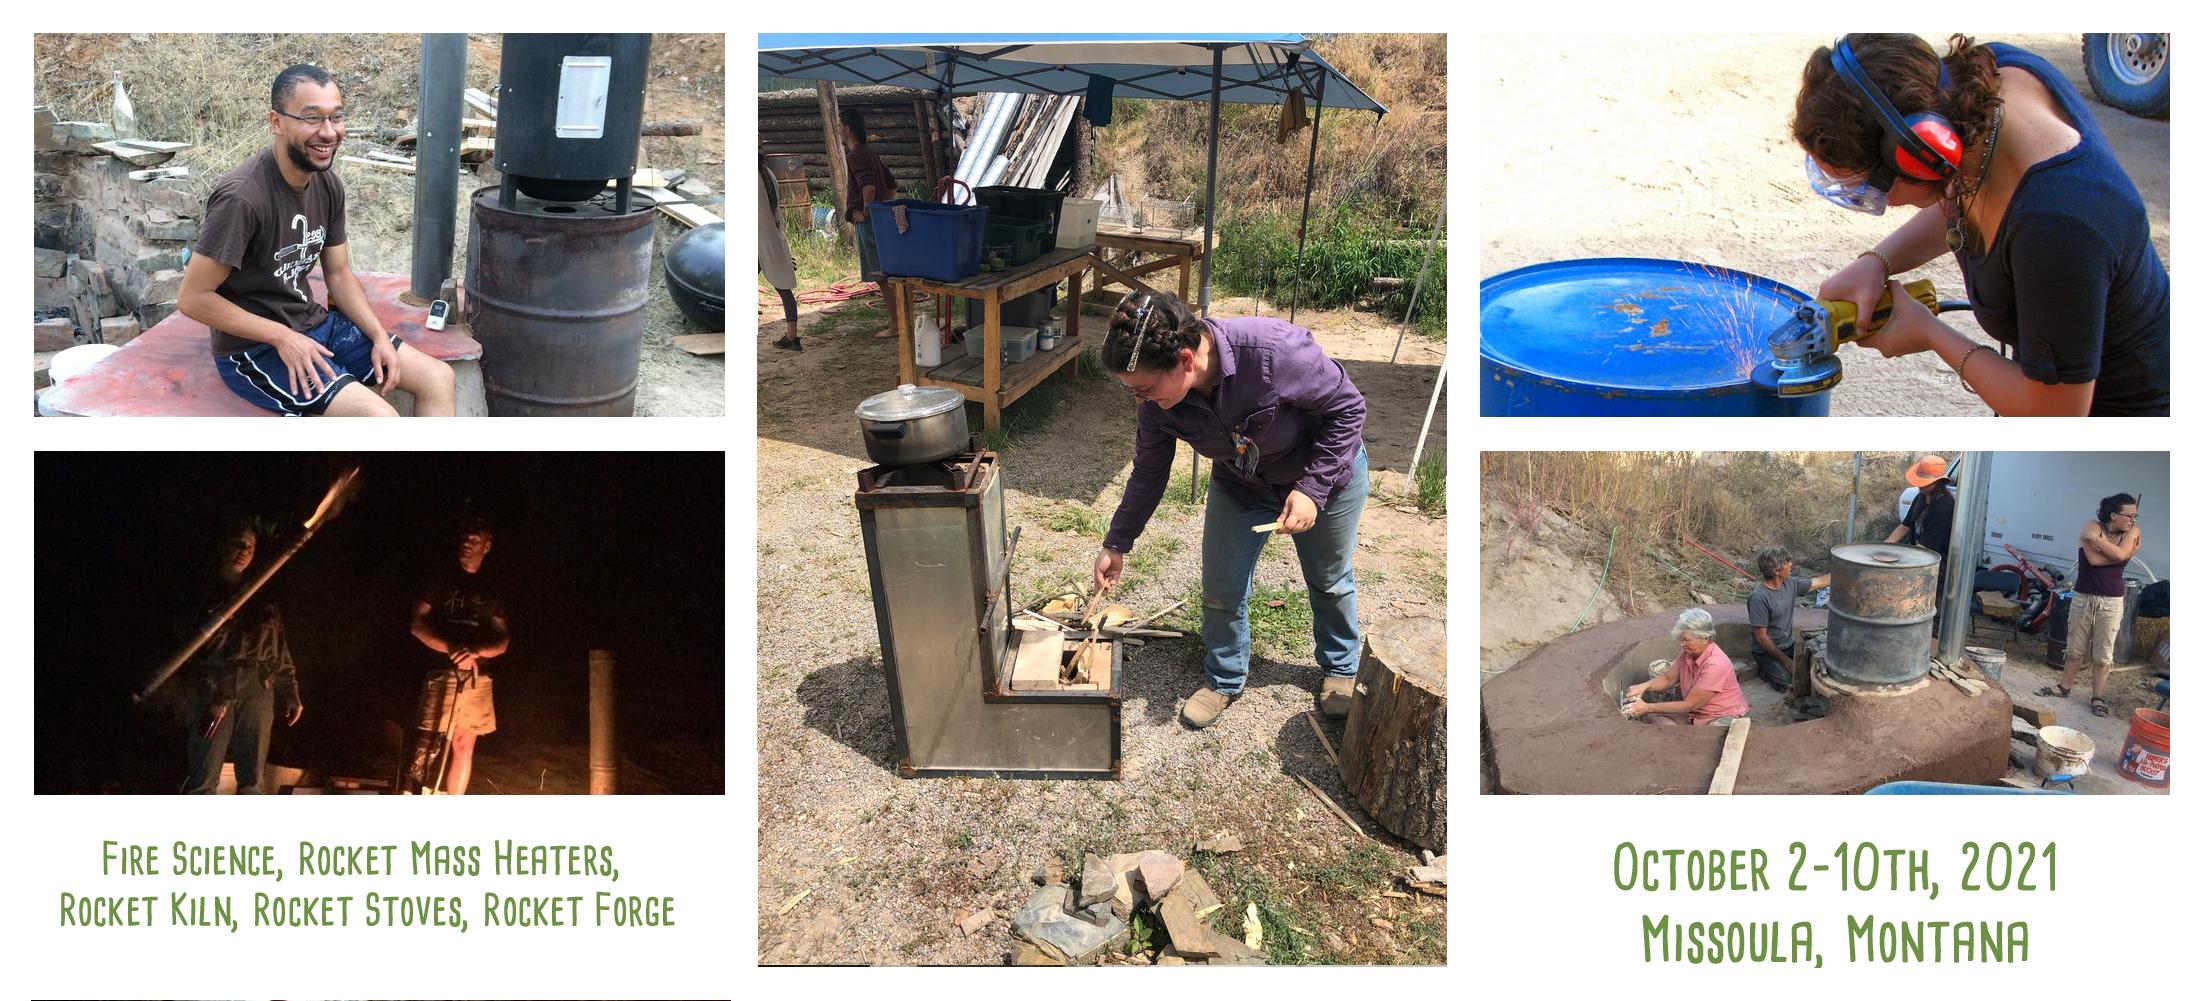 Rocket mass heater Jamboree at wheaton labs people learning woodfired technology